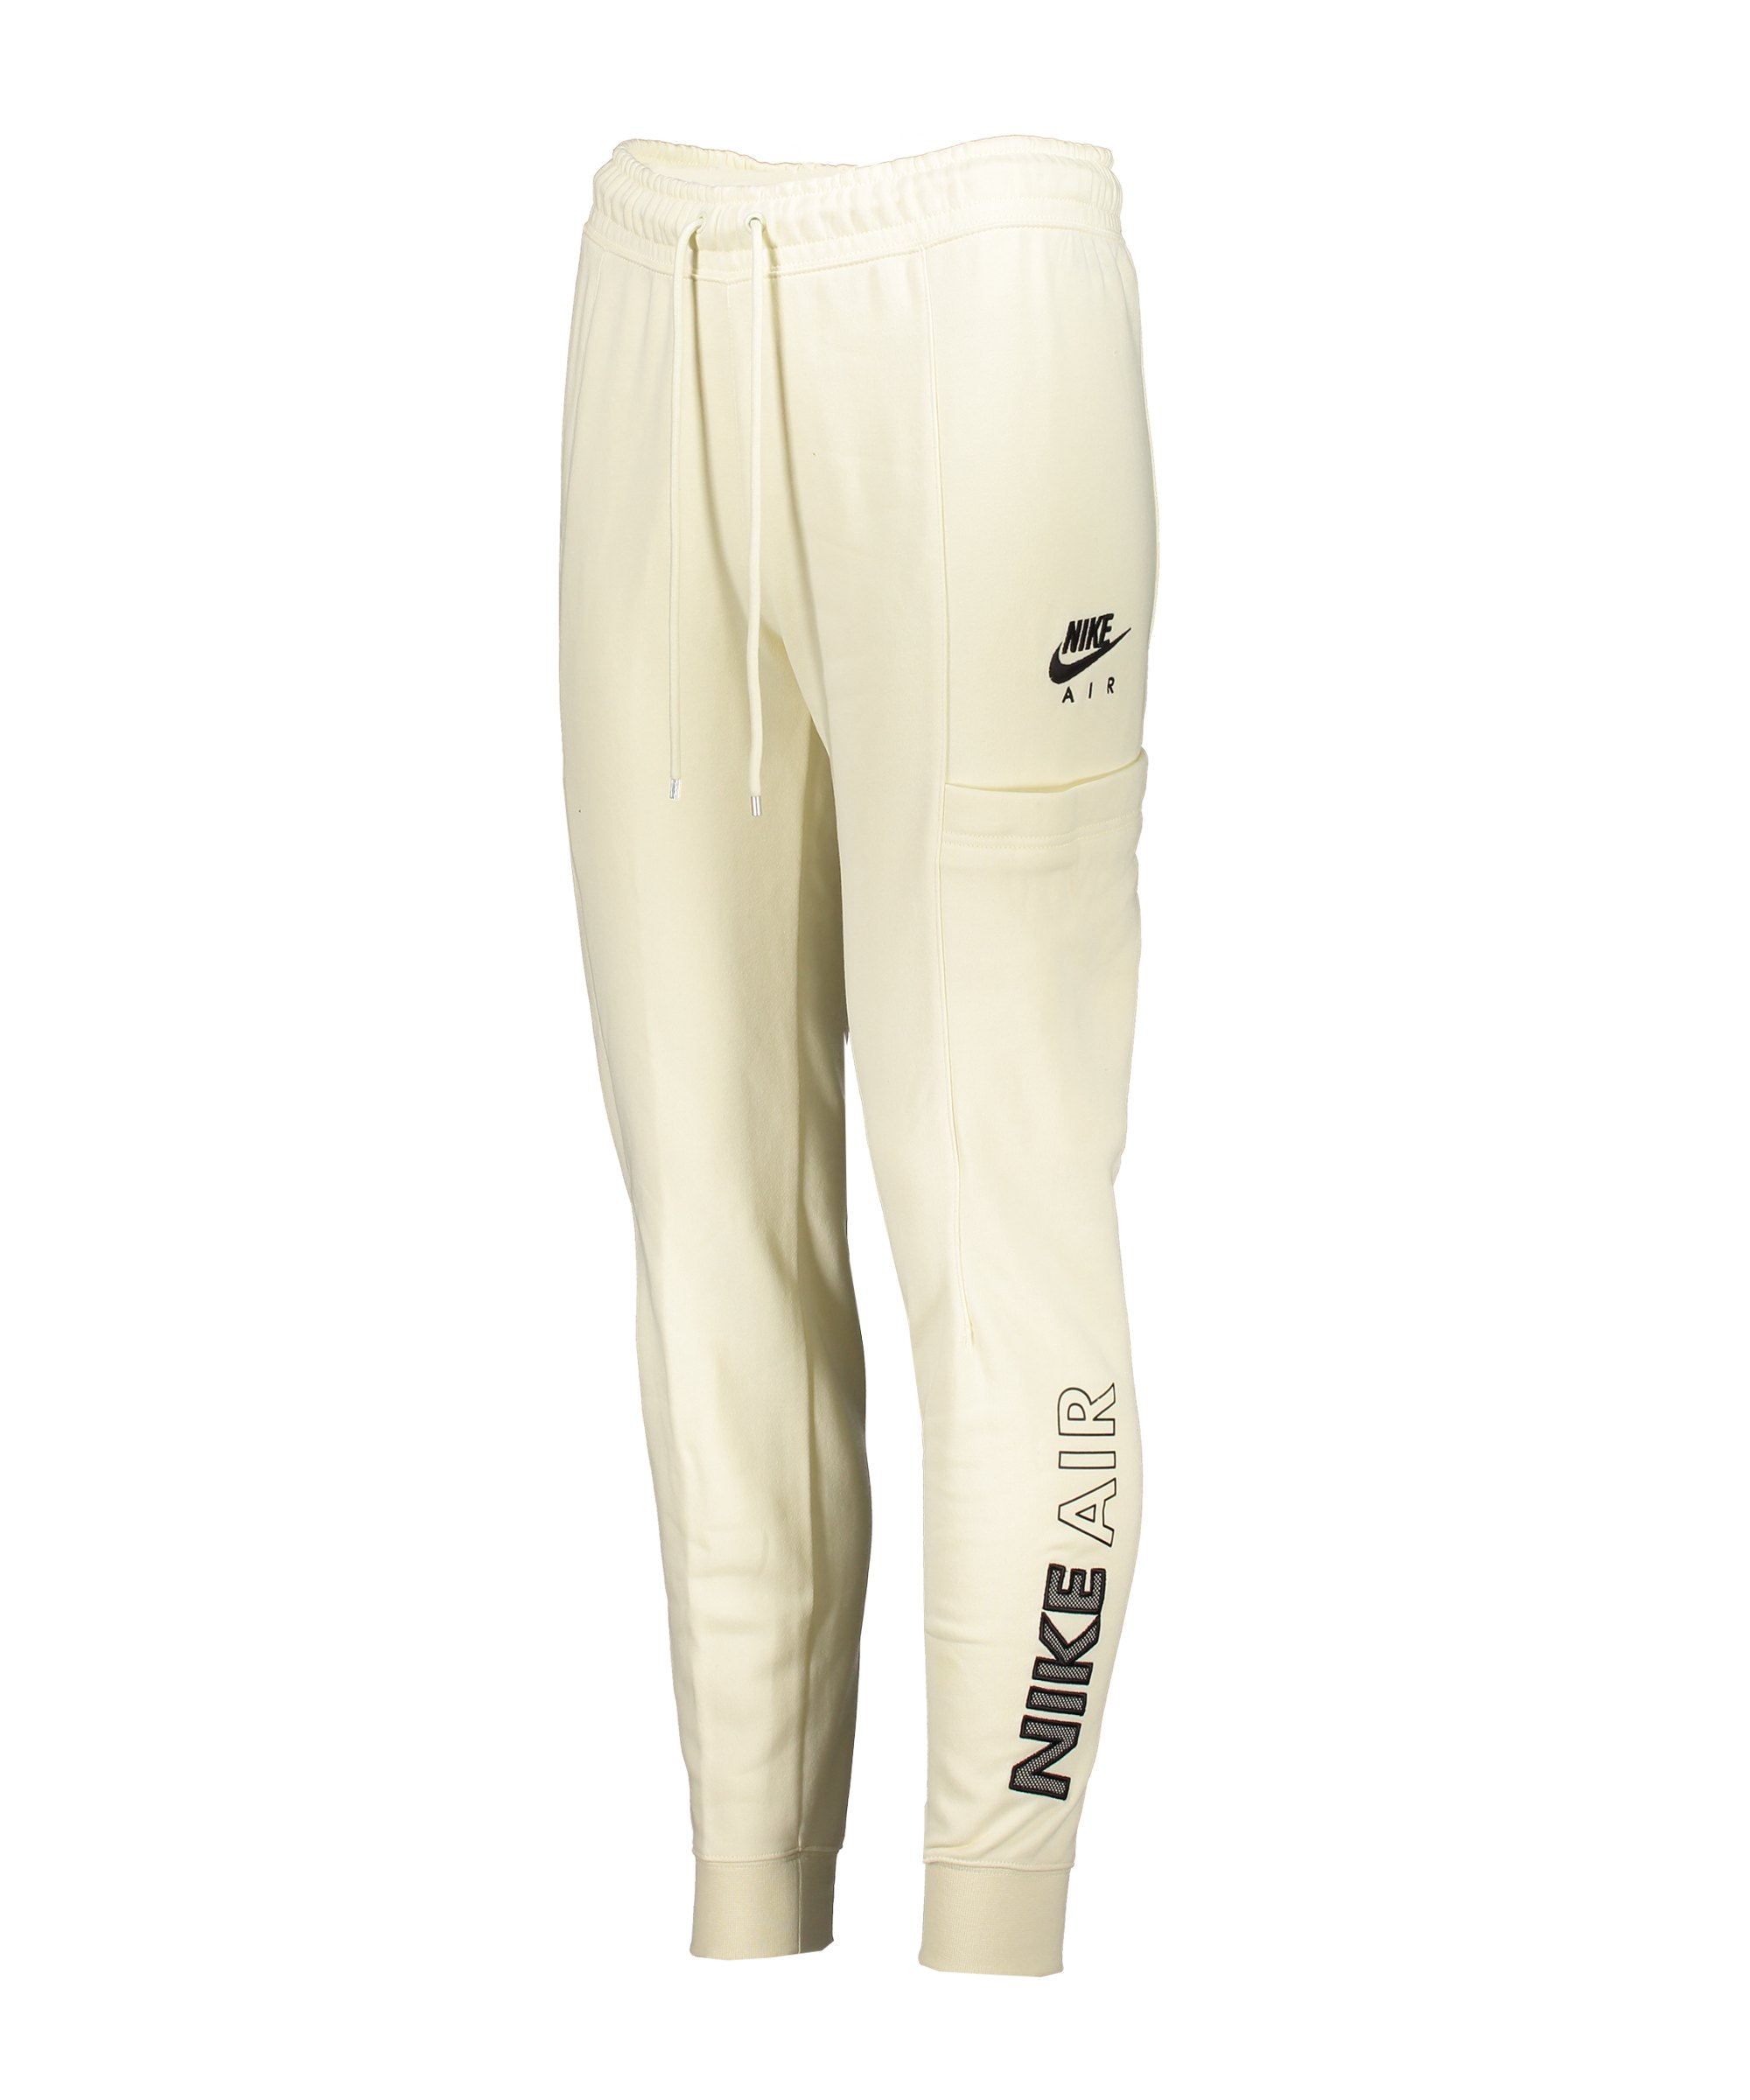 Nike Air Jogginghose Damen Beige Schwarz F113 - beige